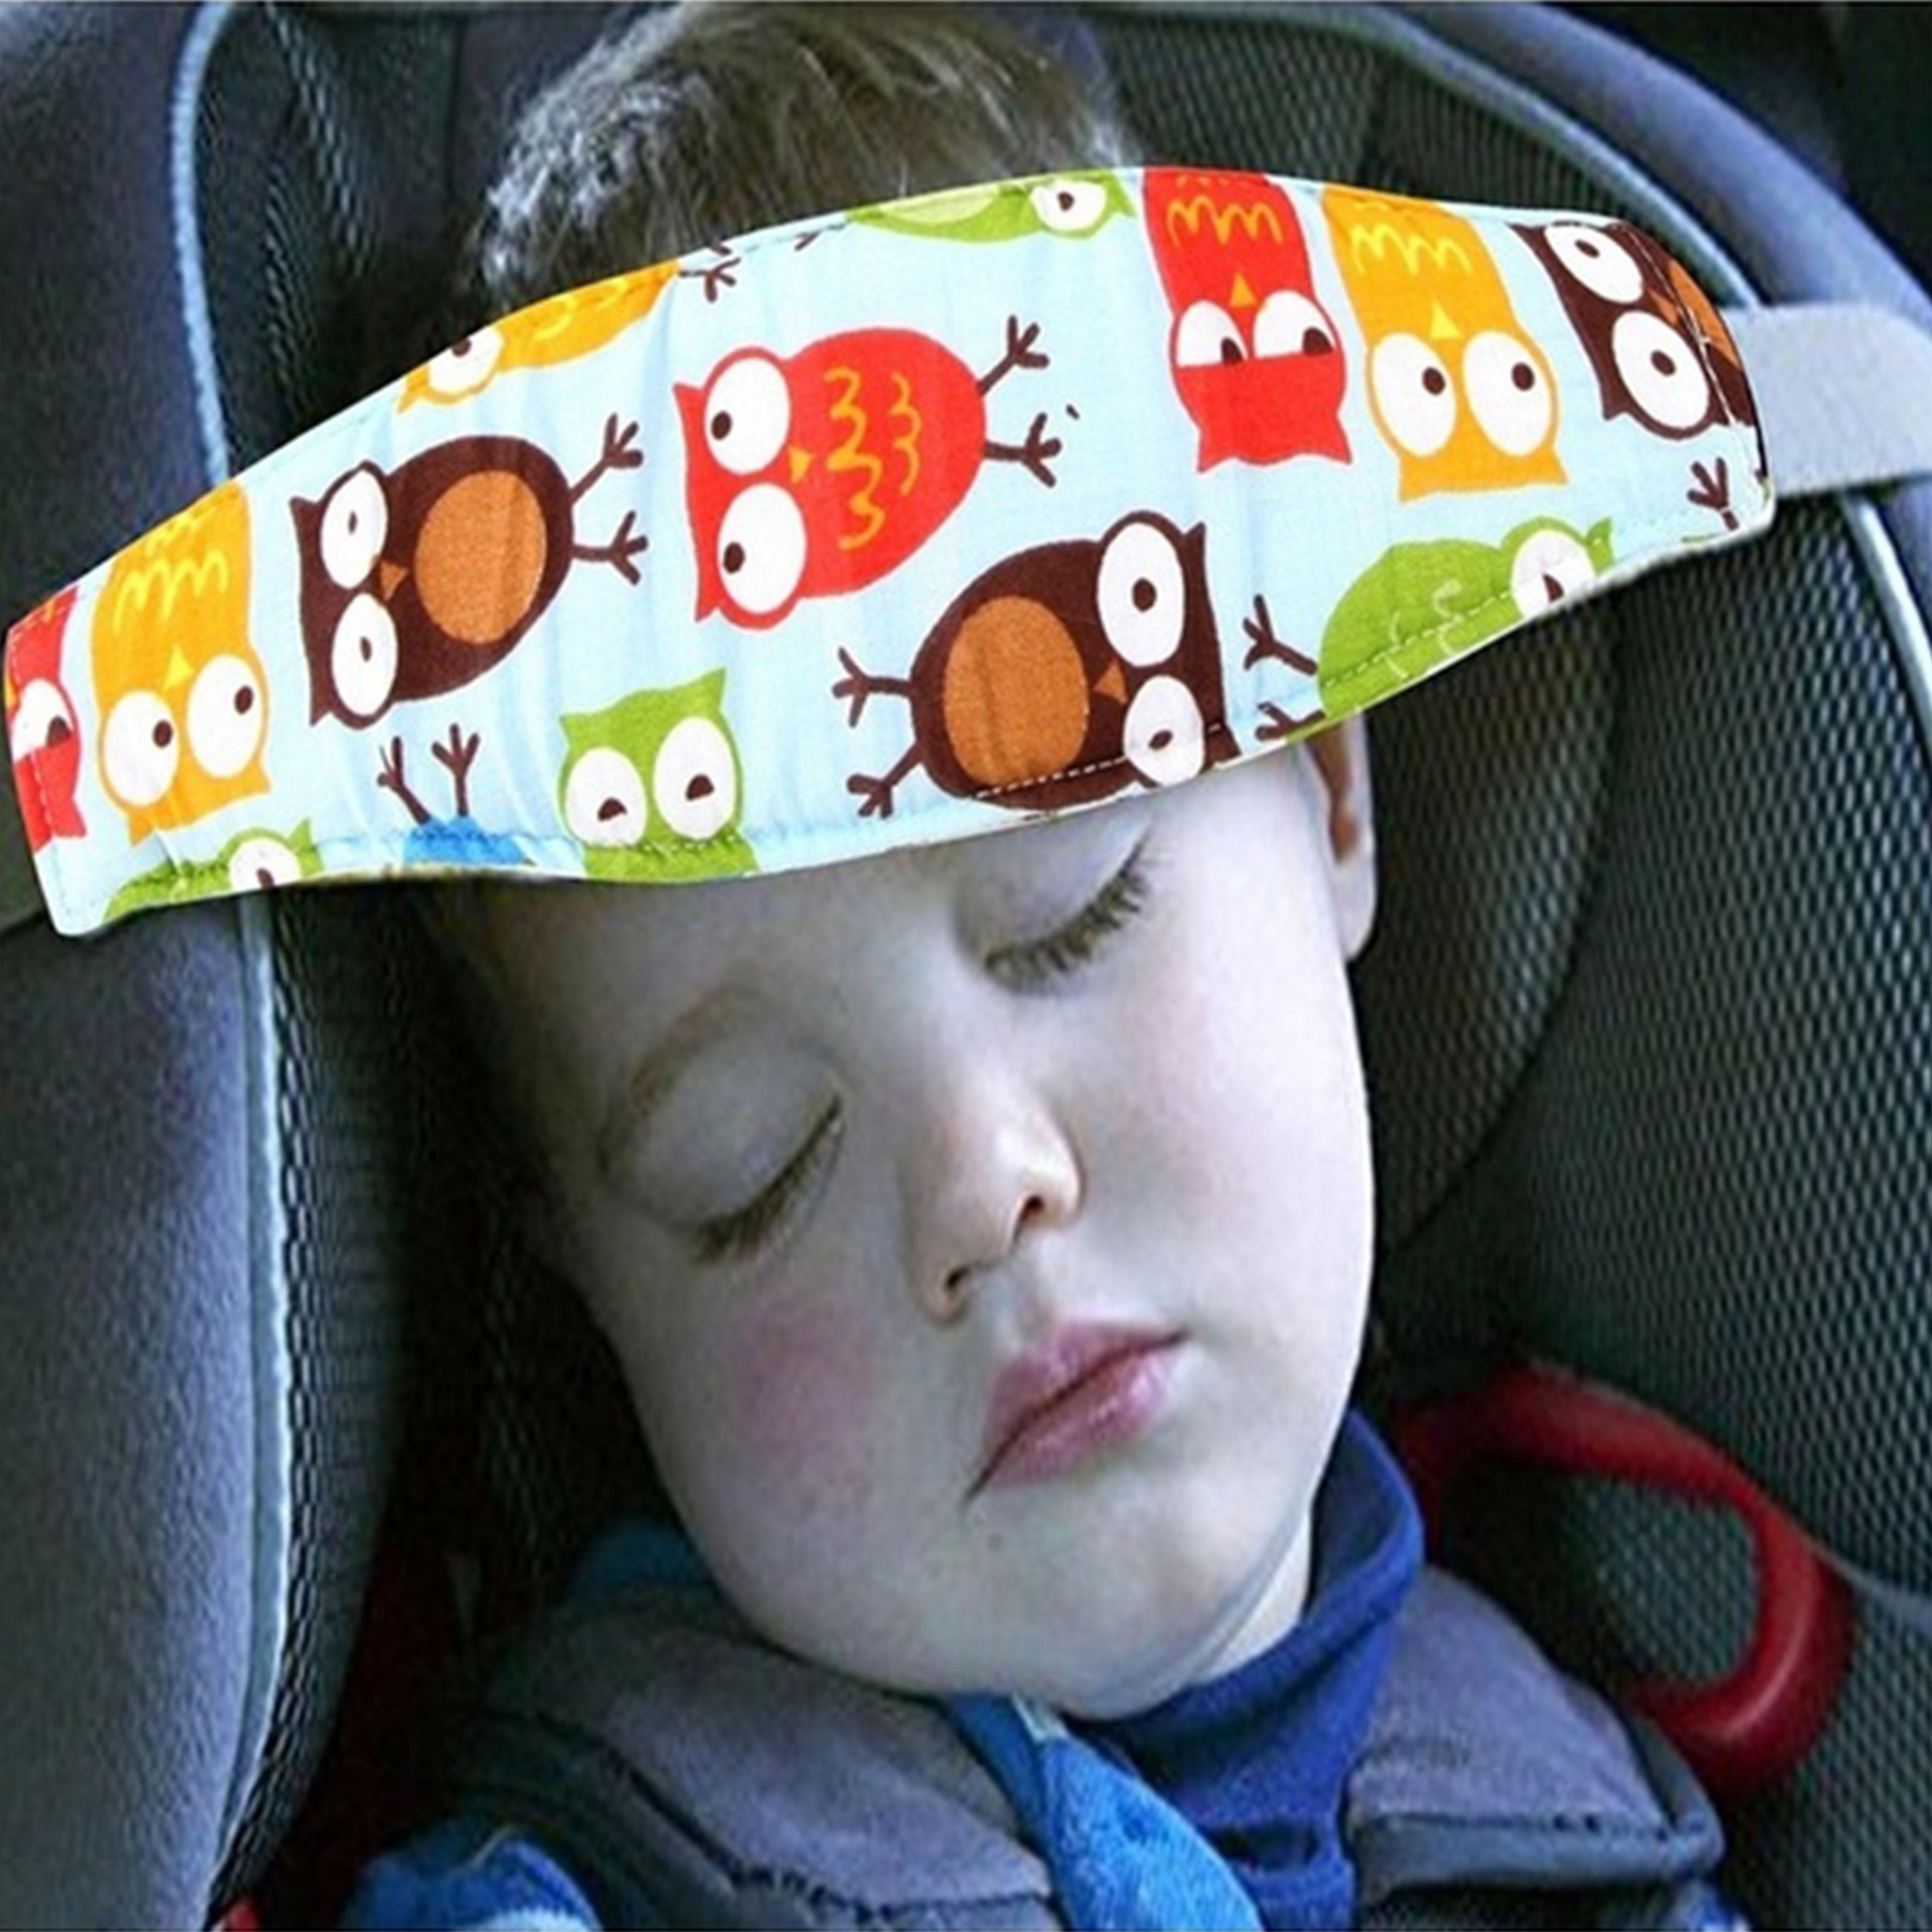 Adjustable Infants And Baby Stroller Head Support Pram Stroller Safety Seat Sleep Positioner Fastening Belt For Baby